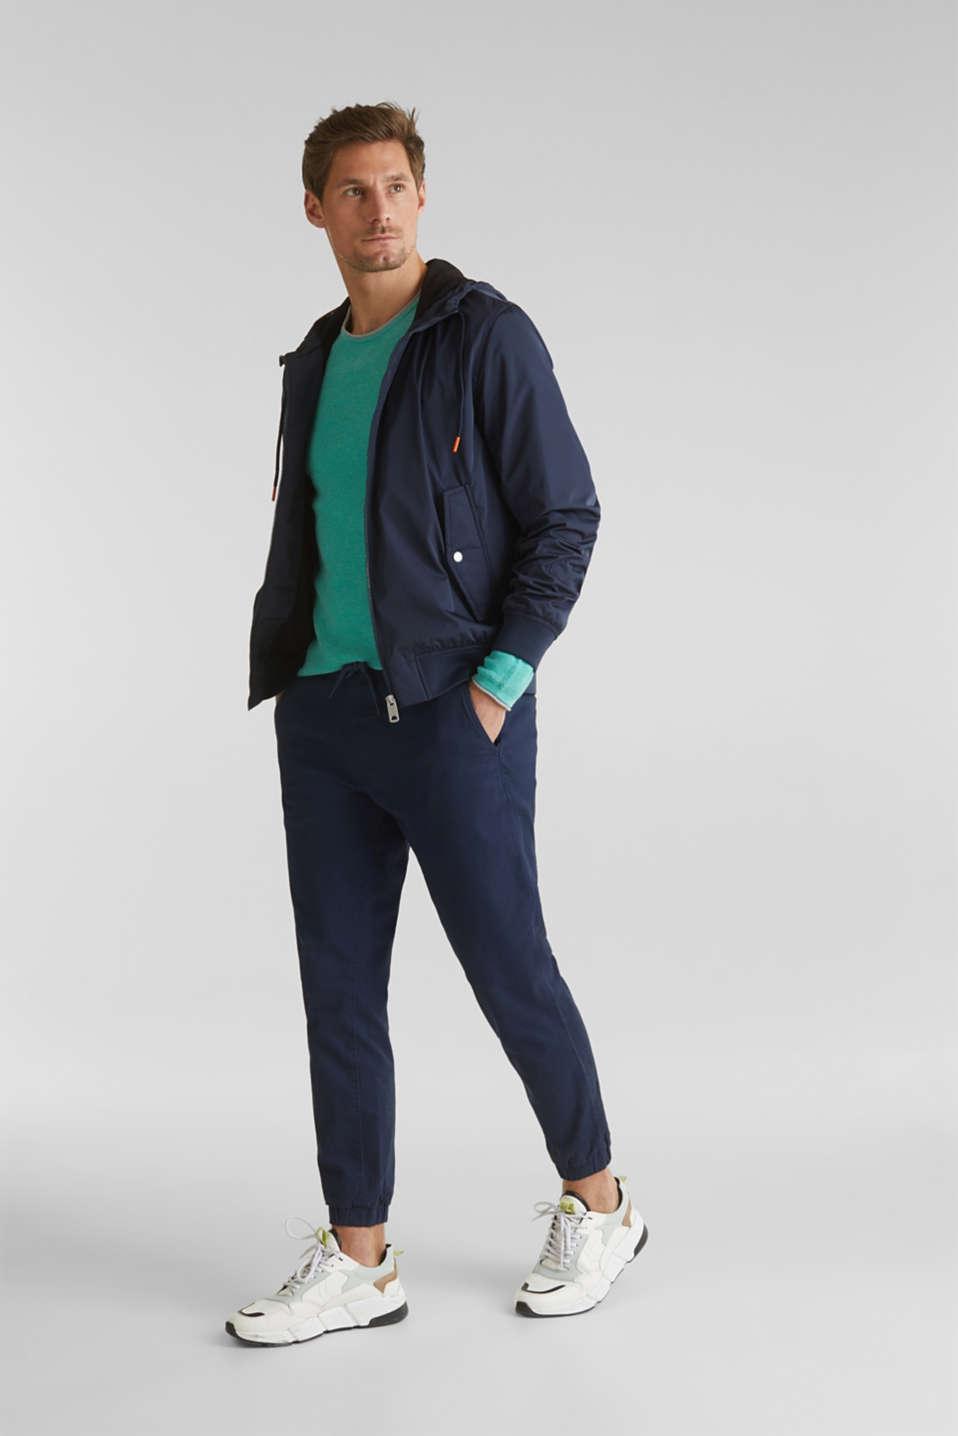 Textured jumper made of 100% cotton, LIGHT AQUA GREEN 5, detail image number 1